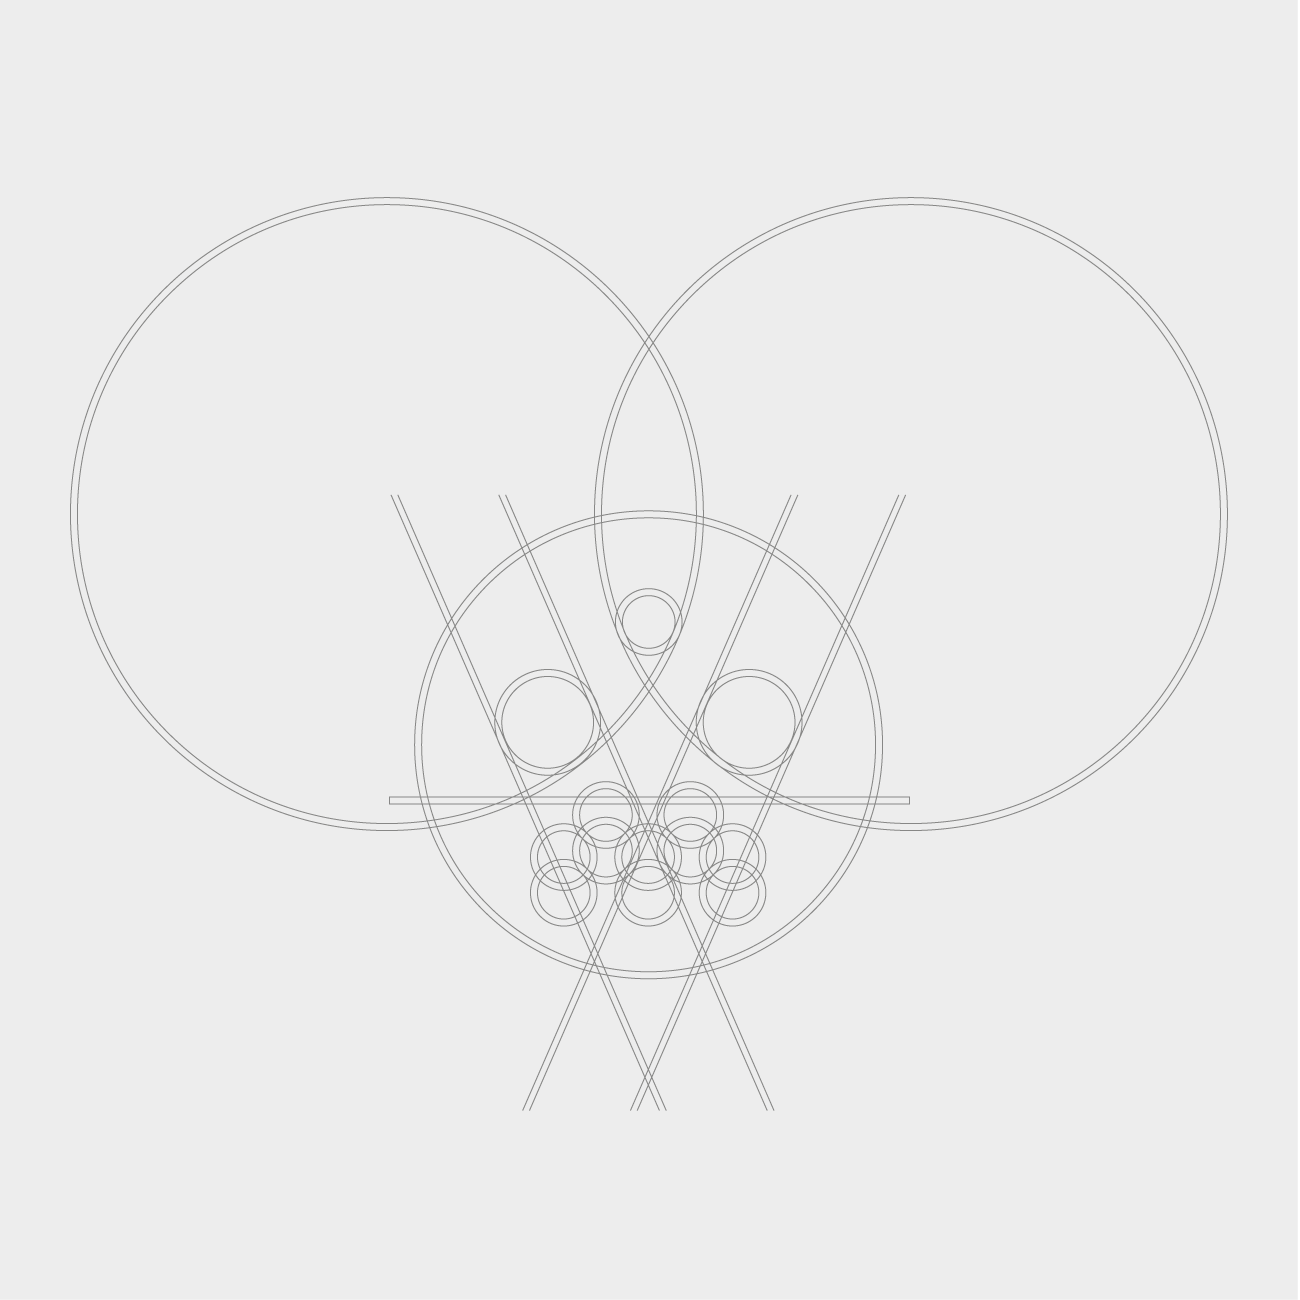 https://www.orlandinifrancesco.com/wp/wp-content/uploads/2019/02/Salento-Deluxe-Logo2.png